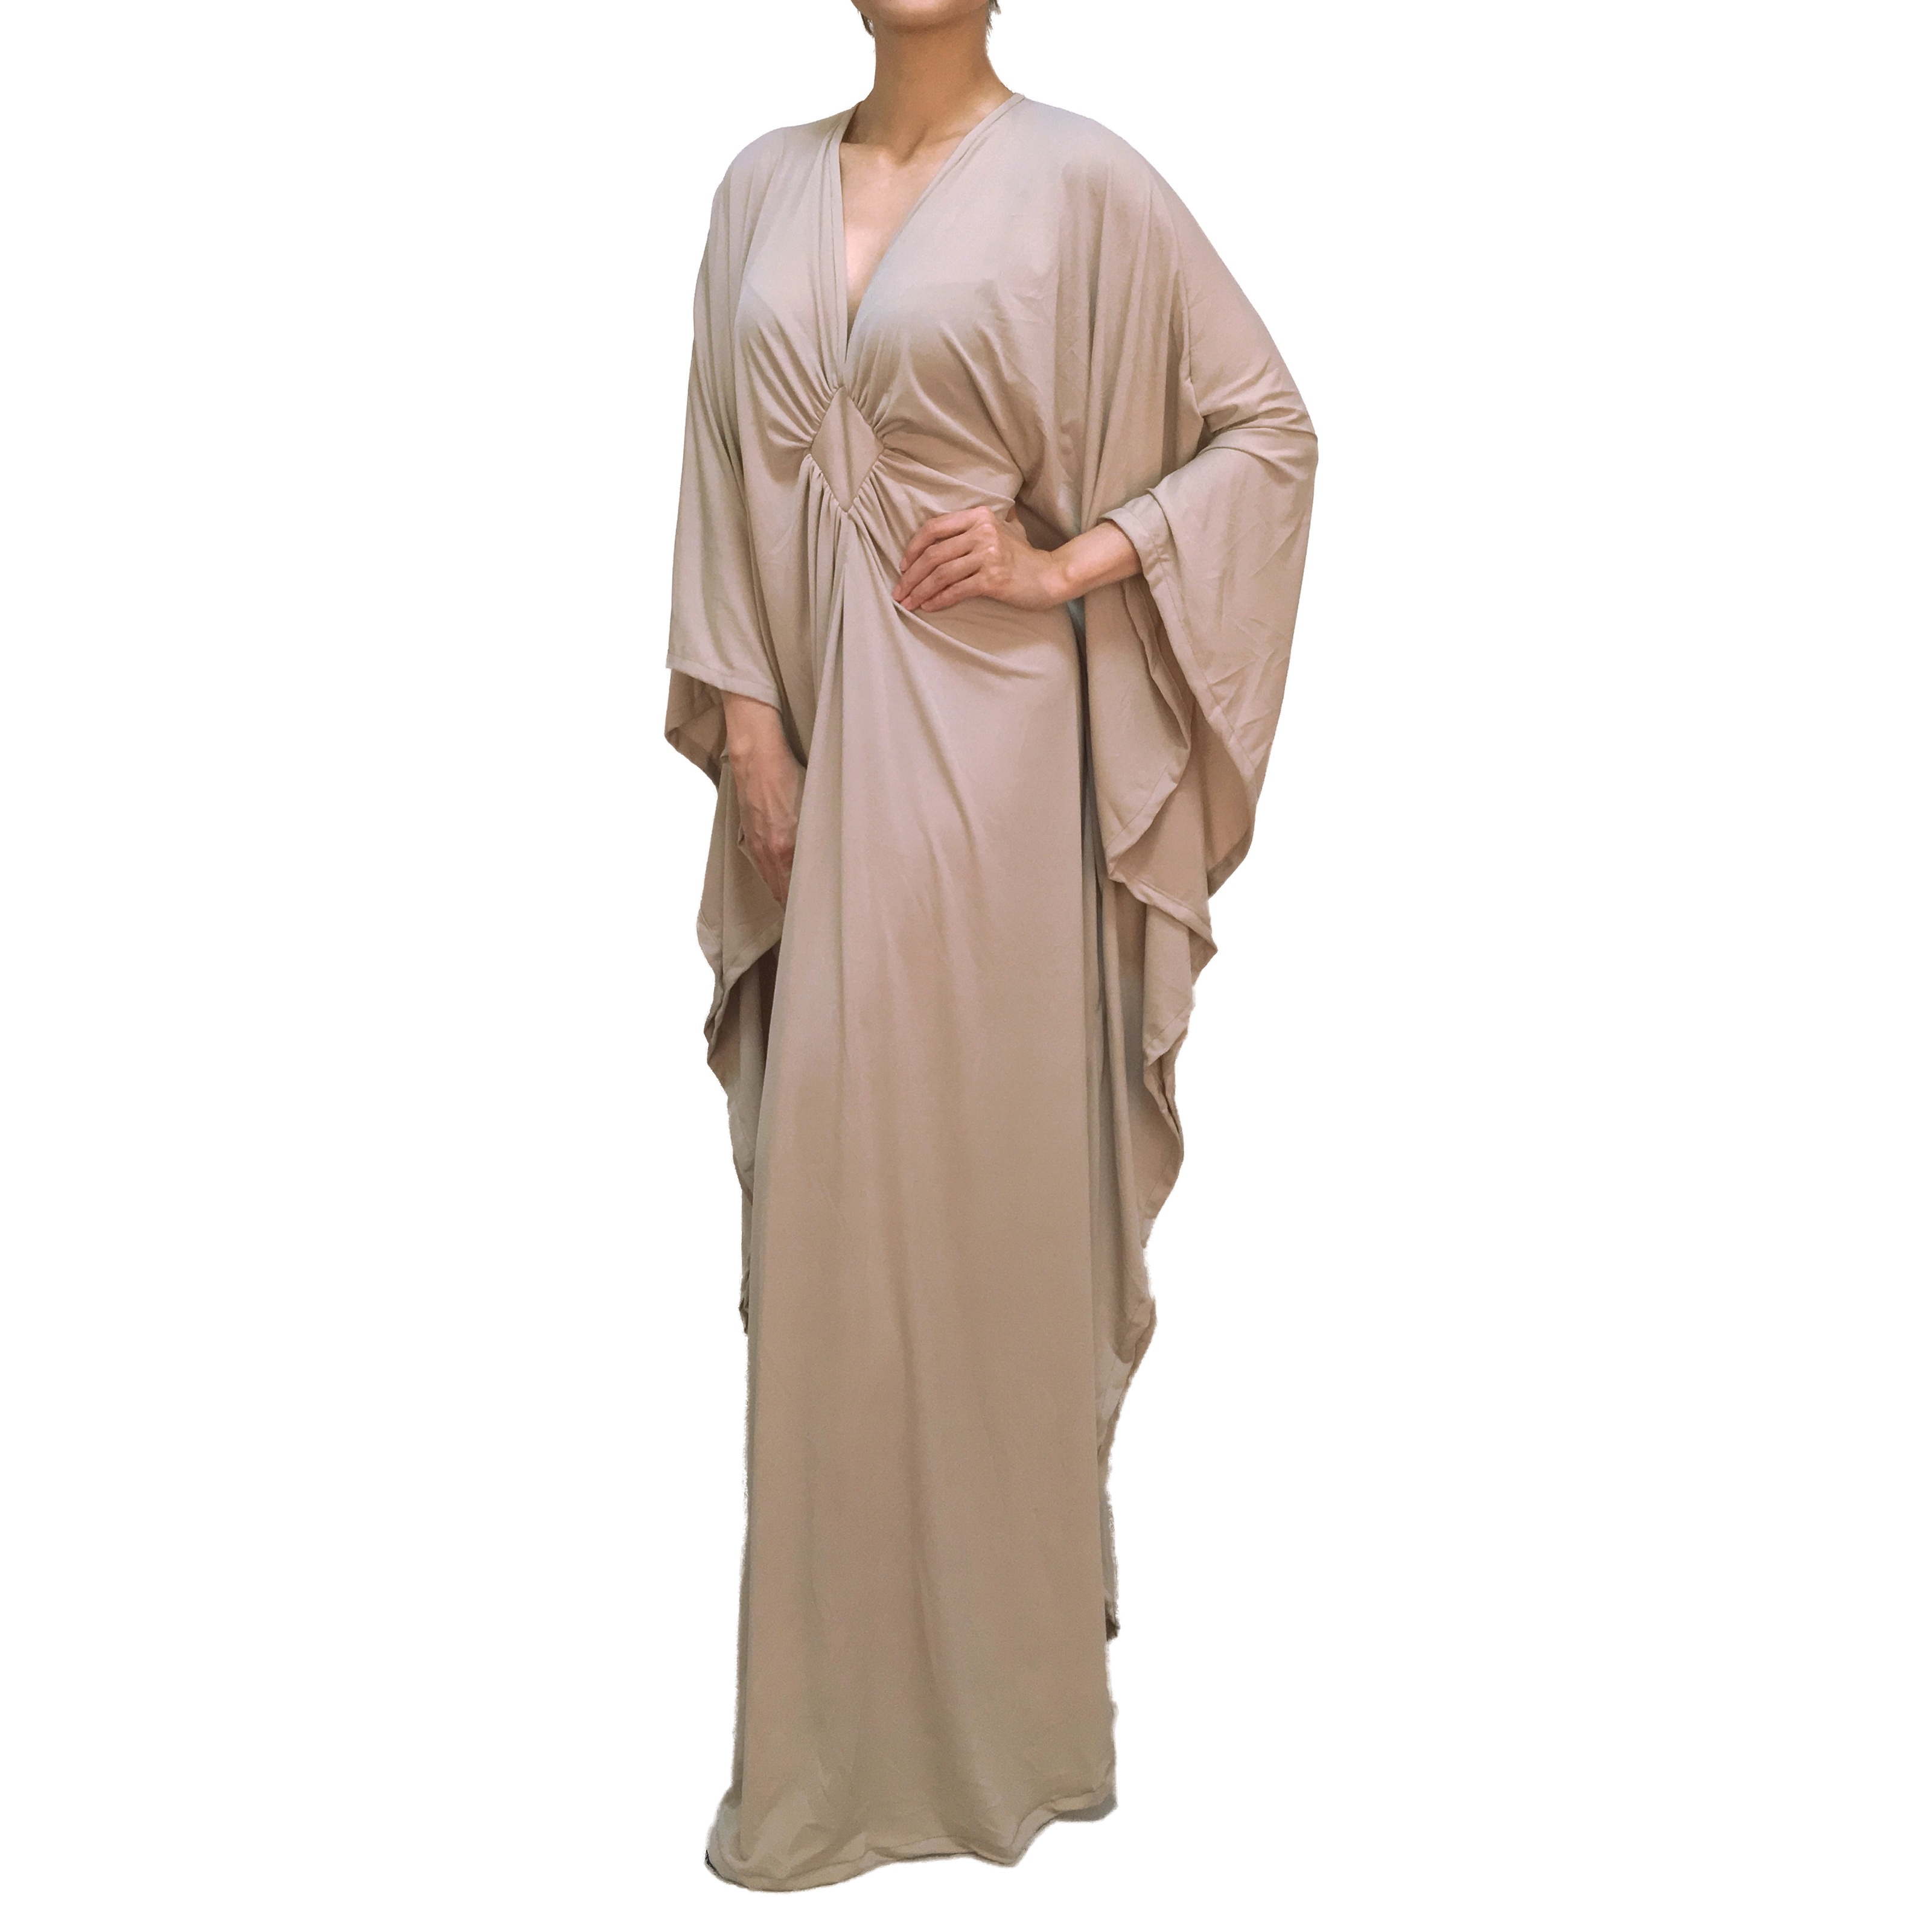 11d931c14a9 Evening Maxi Dresses For Weddings Plus Size - raveitsafe